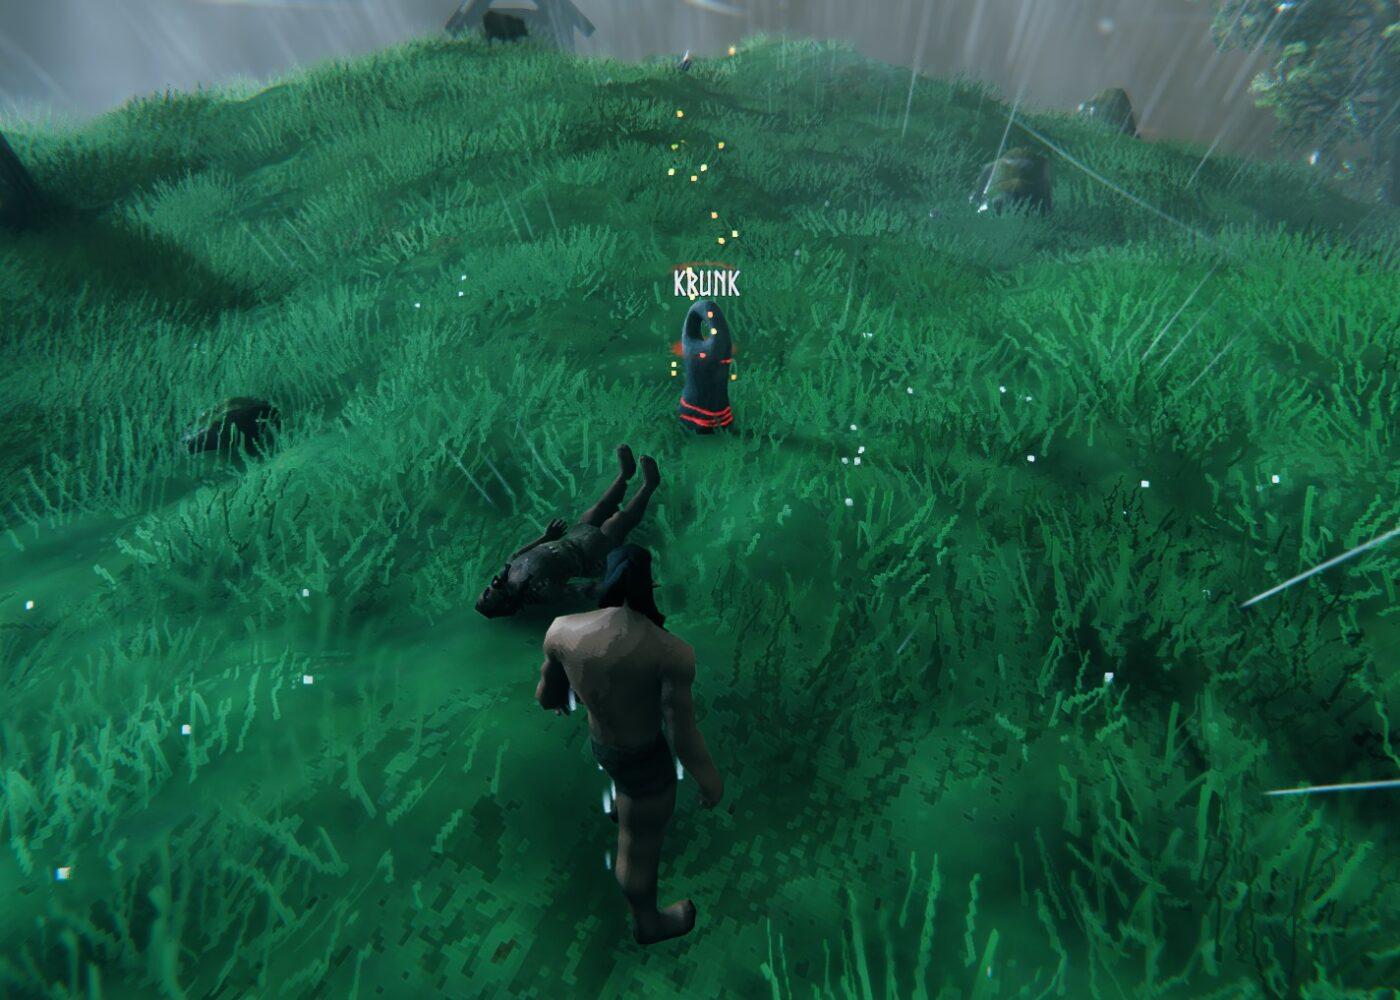 5Death - Hel draws closer